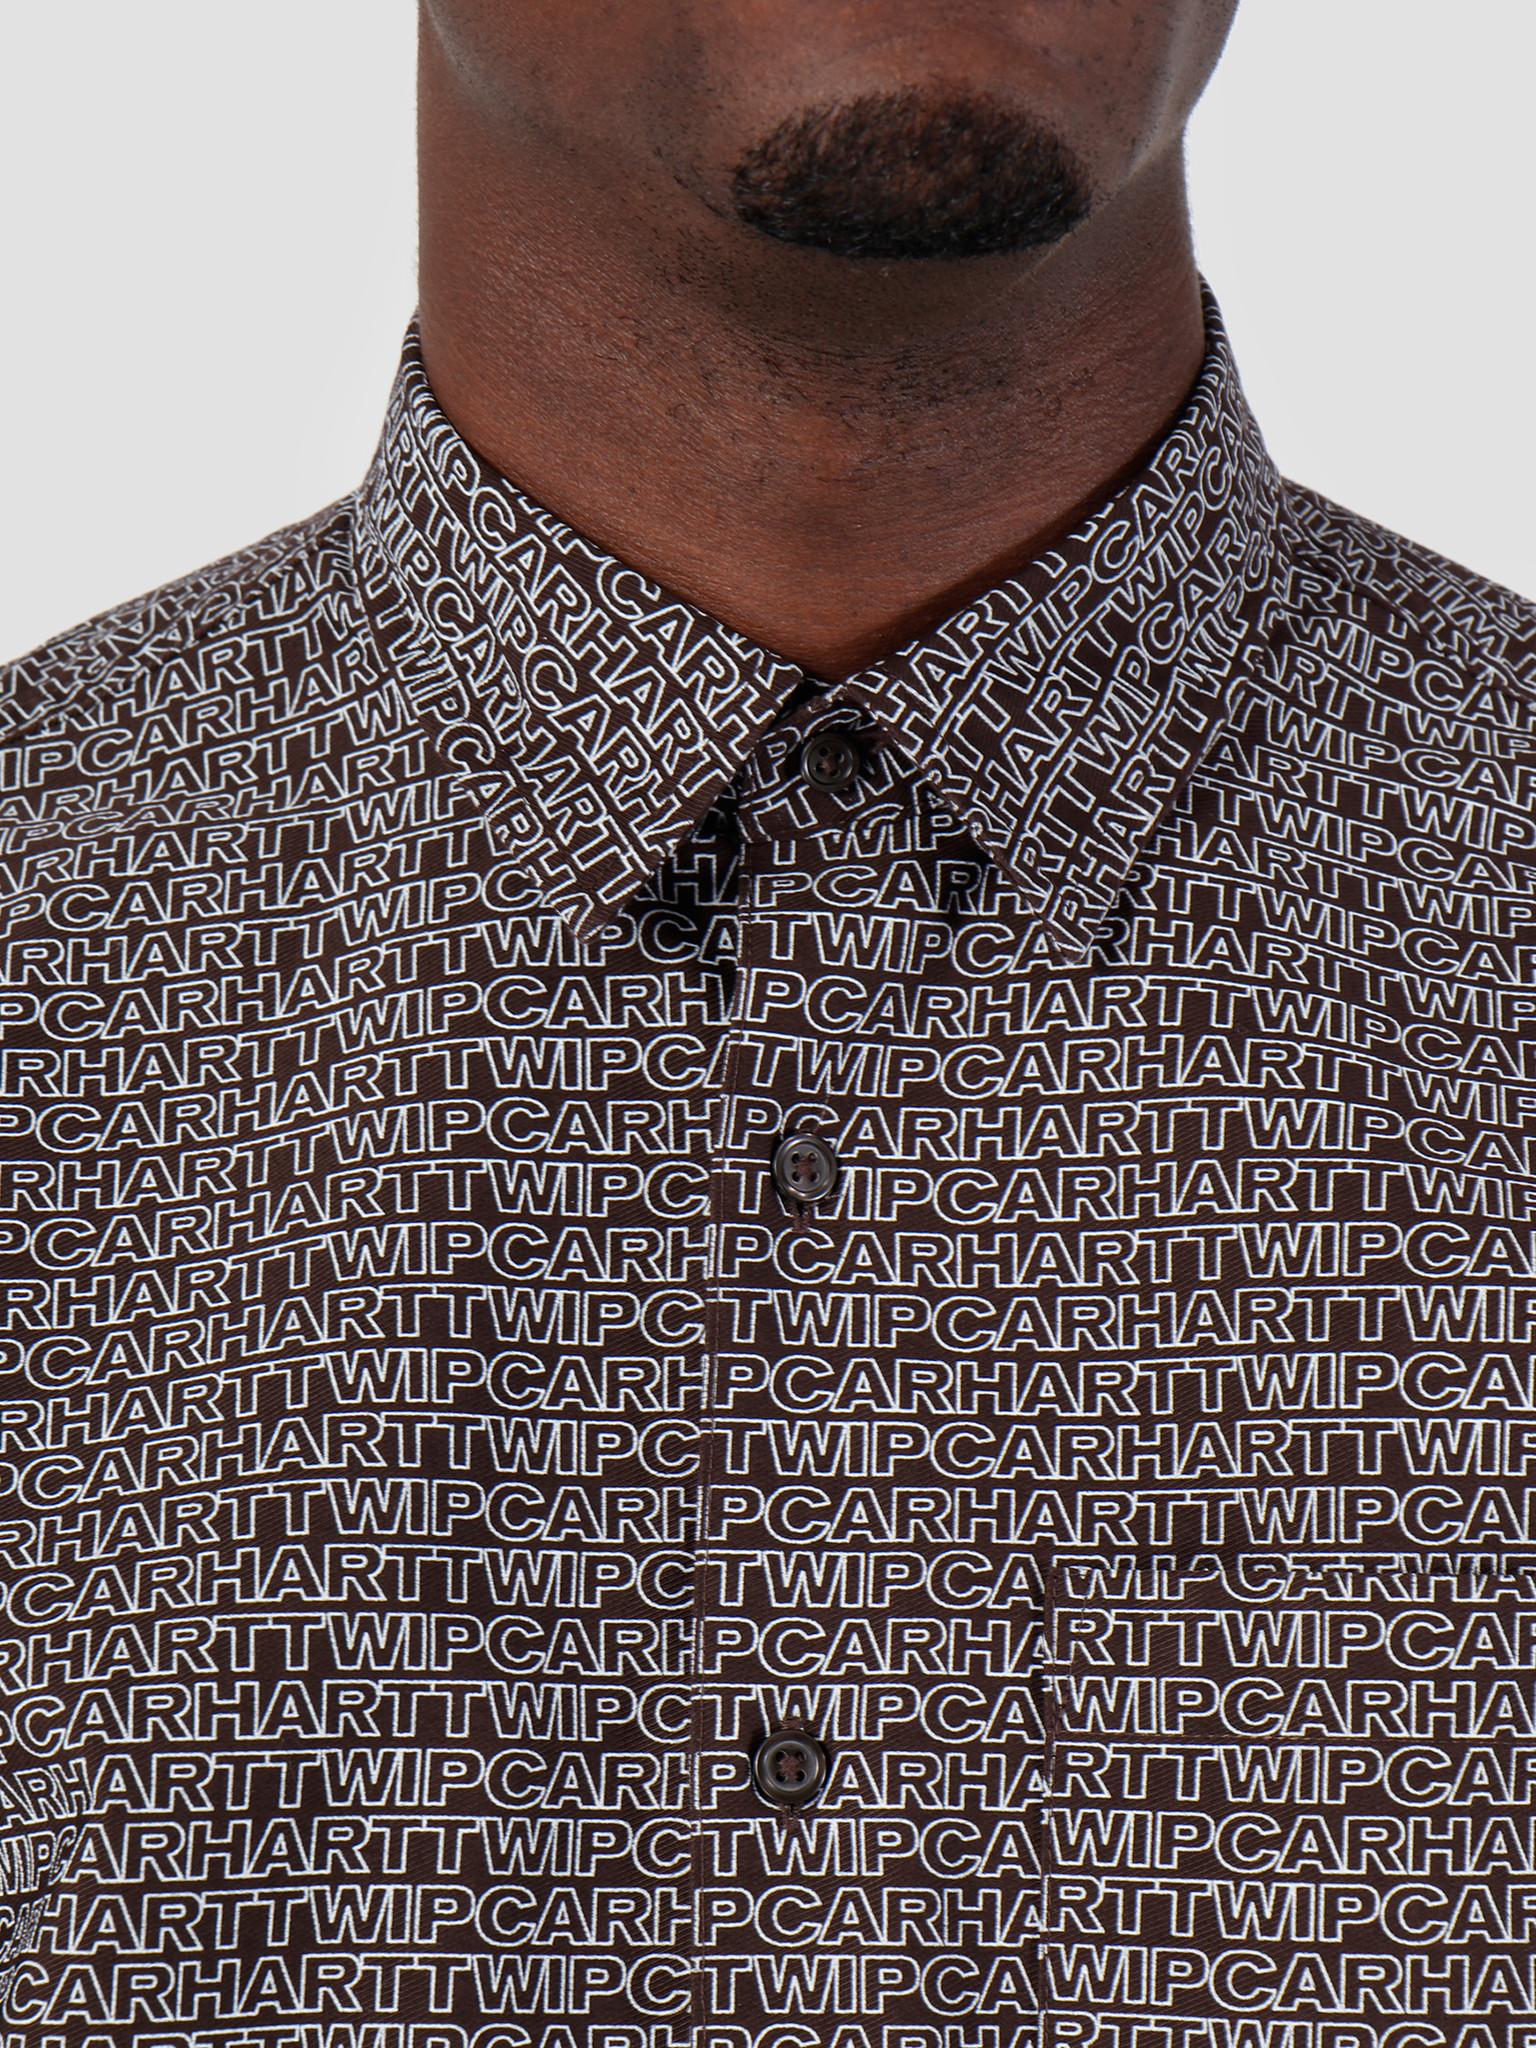 Carhartt WIP Carhartt WIP Short Sleeve Typo Shirt Typo Print Tobacco Wax 62052000